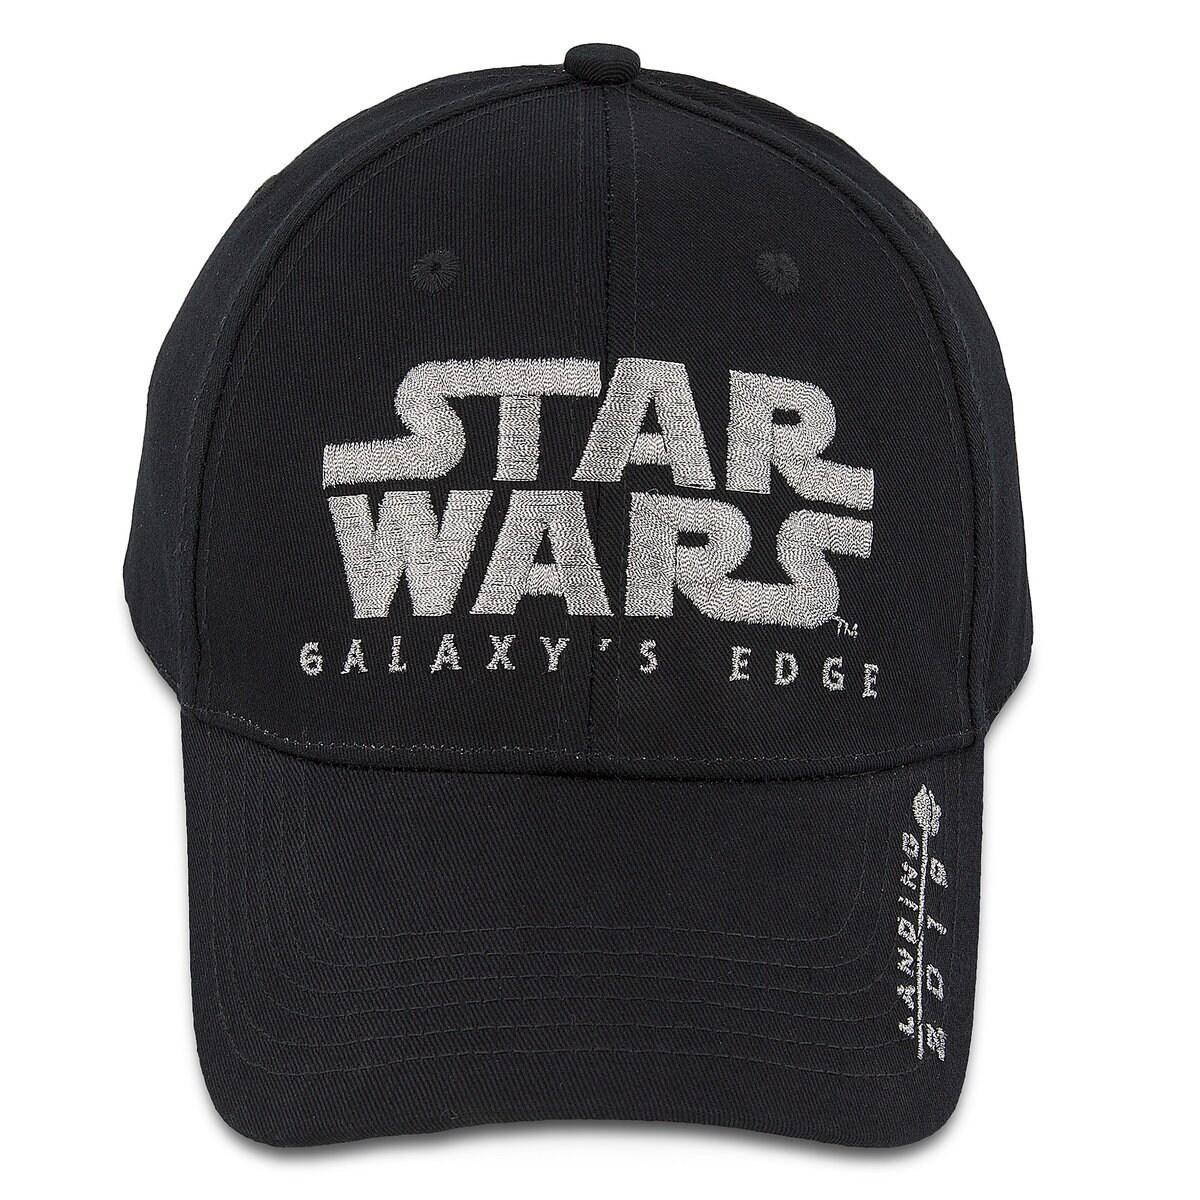 2fb572ff844b5 Product Image of Star Wars: Galaxy's Edge Baseball Cap for Adults # 1